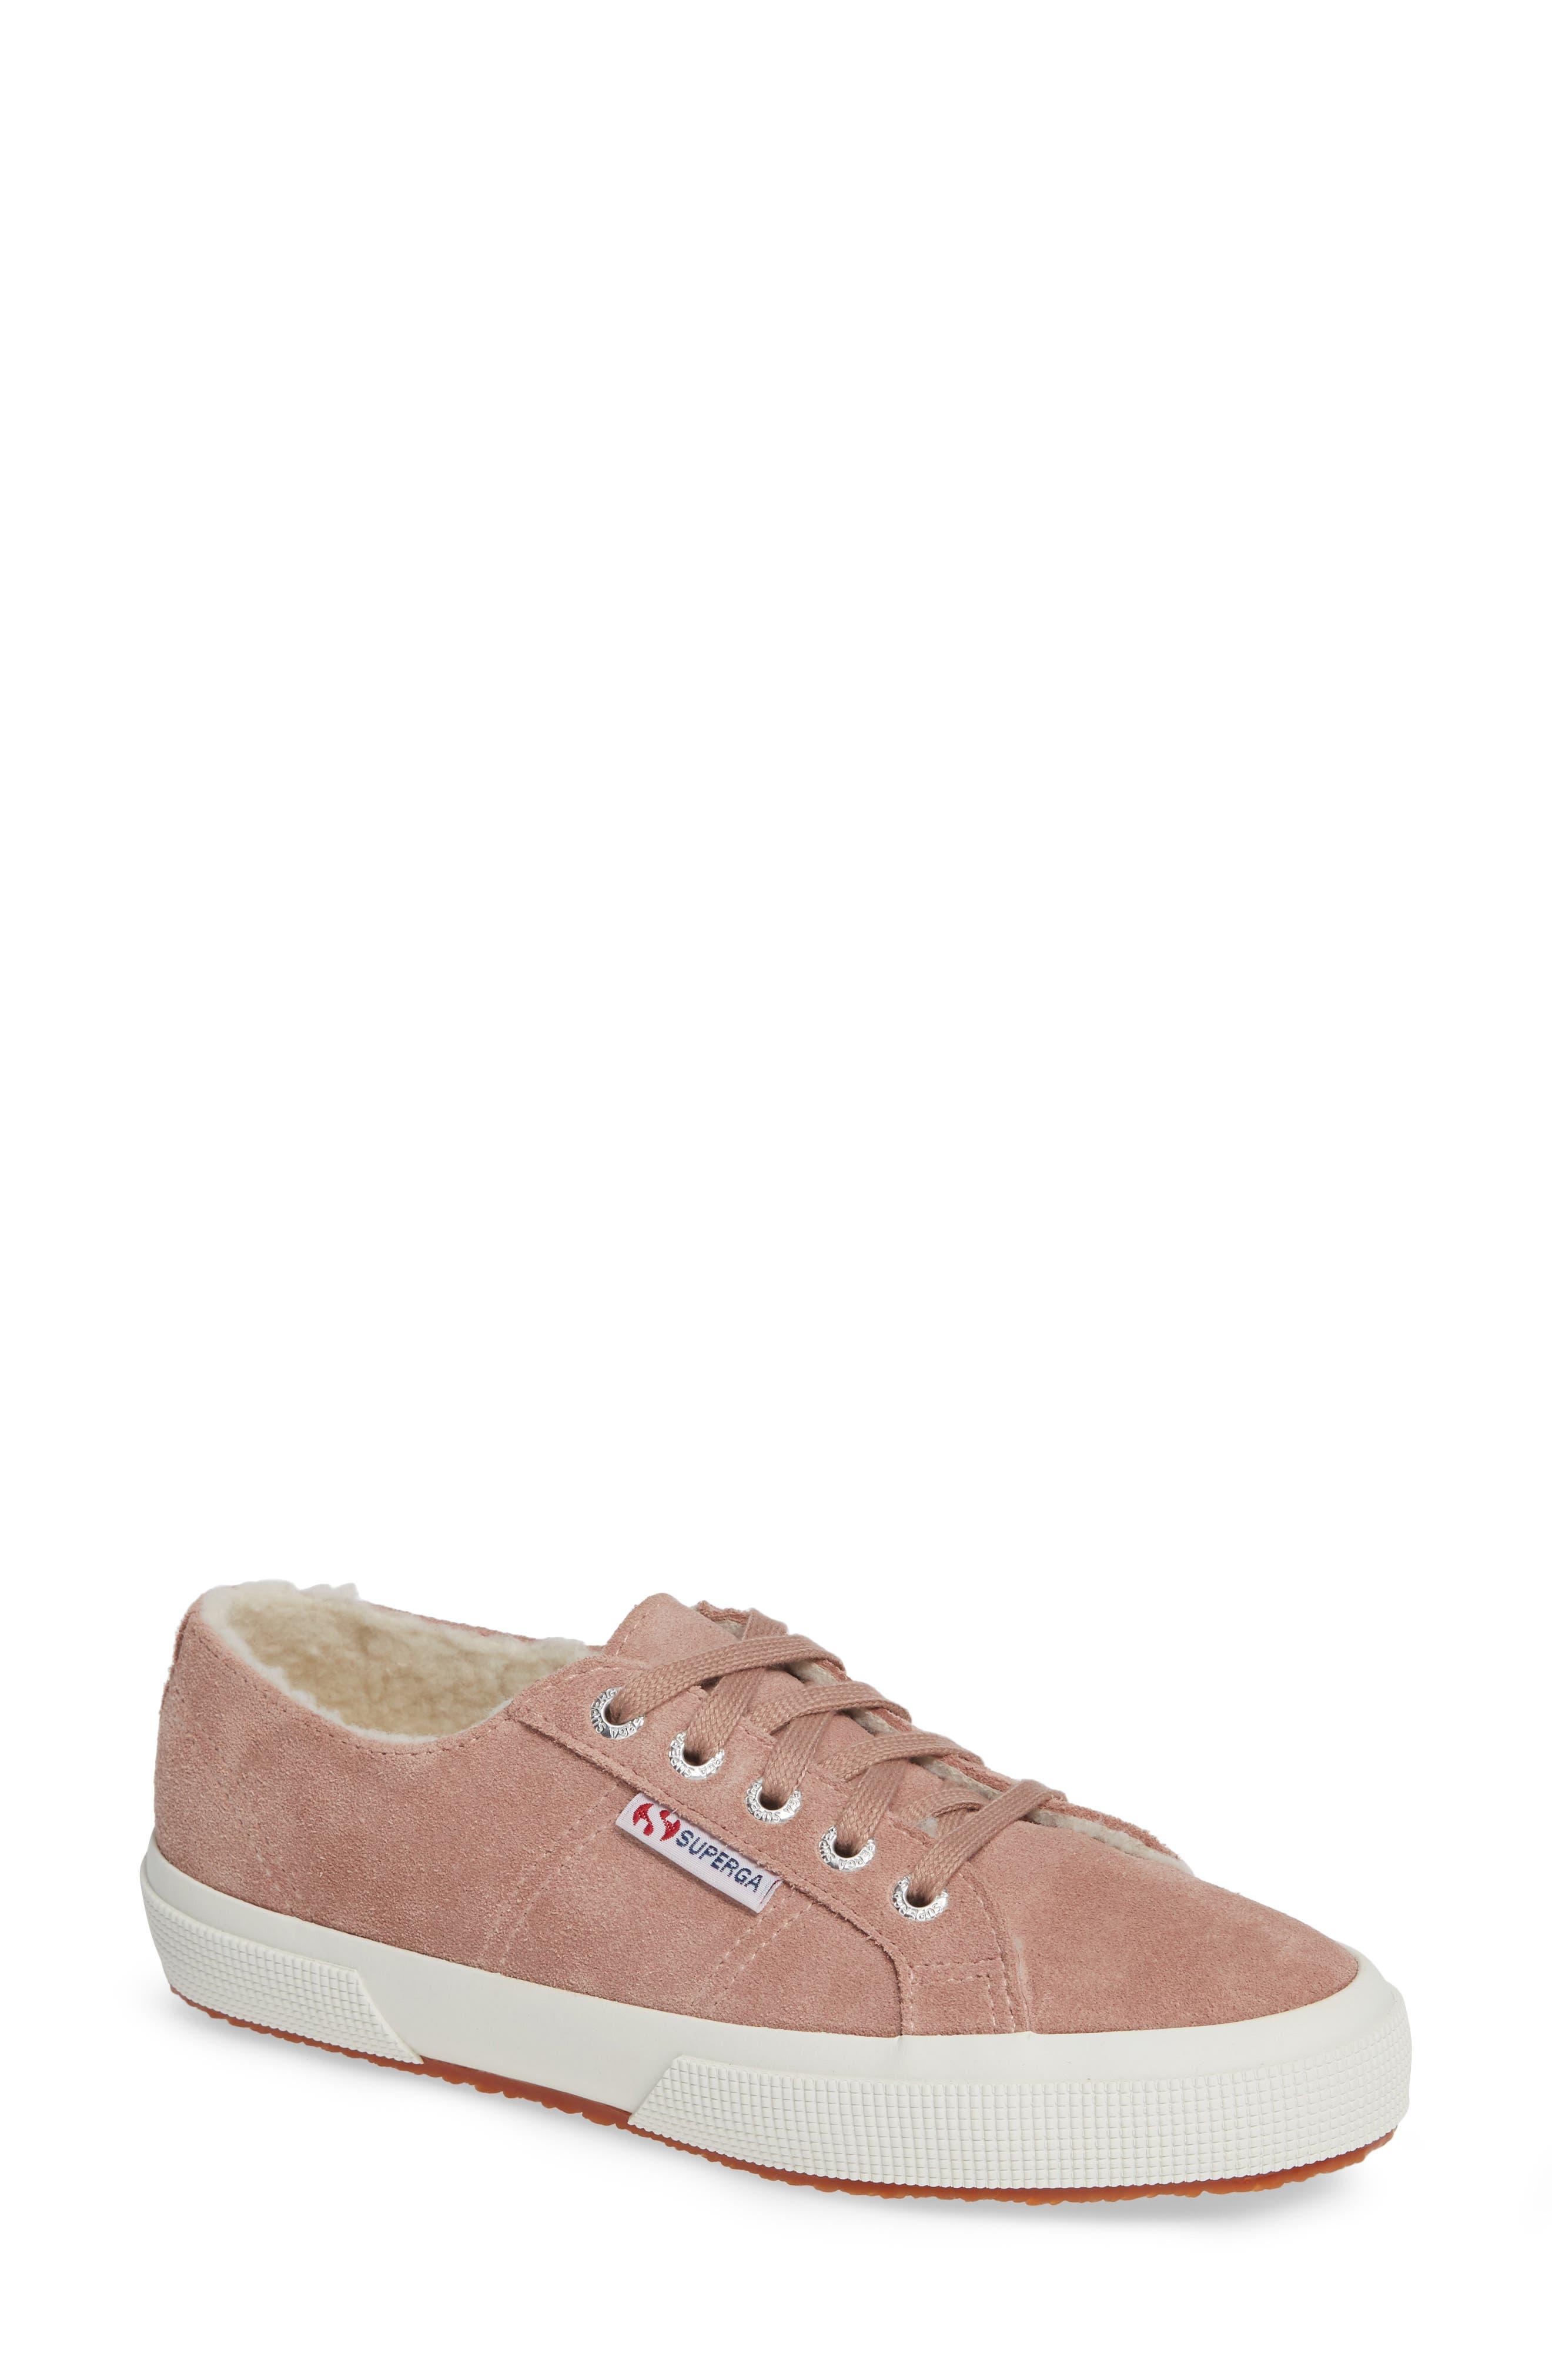 2750 Suefurw Sneaker,                             Main thumbnail 1, color,                             ROSE SUEDE